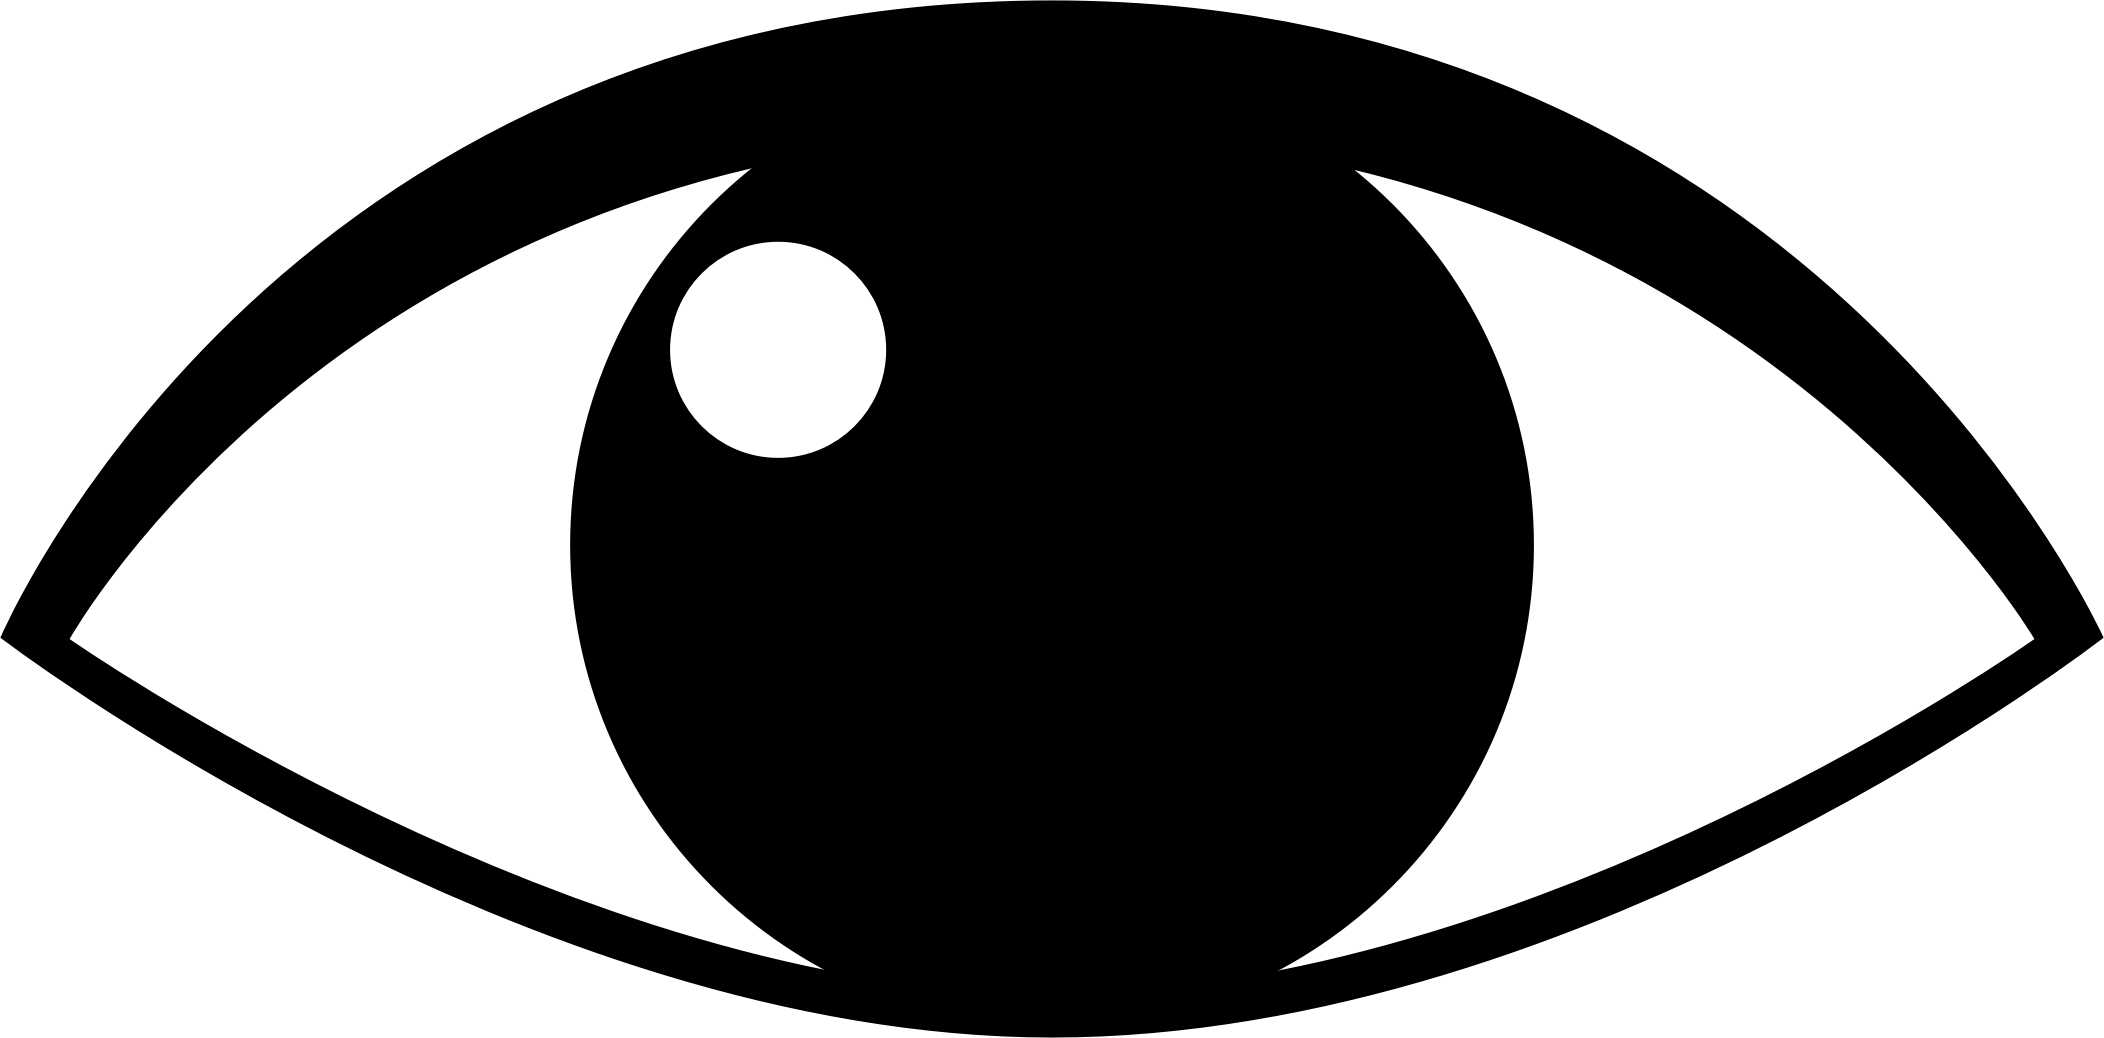 Eyeball Clipart 2-Eyeball clipart 2-8